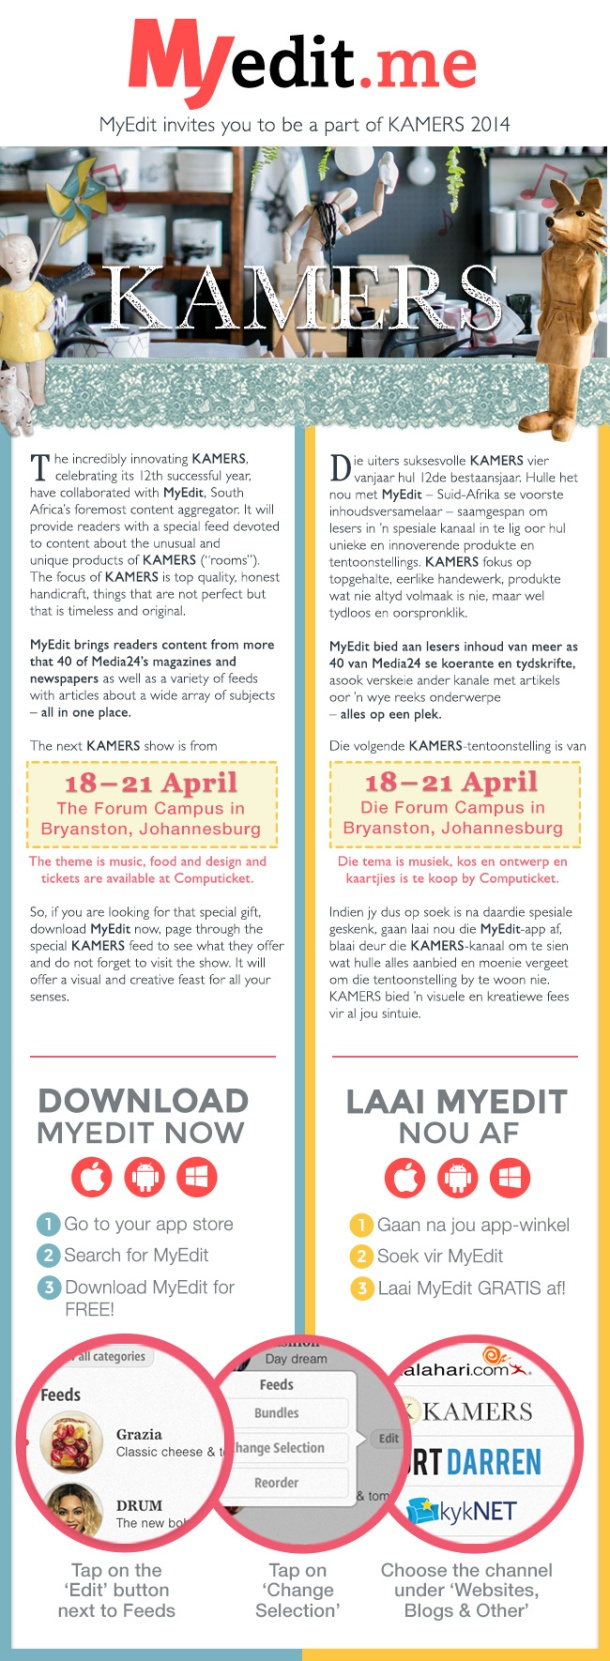 MyEdit invites you to be a part of KAMERS 2014 Easter in Joburg, 18-21 April. | www.kamersvol.com | www.myedit.me